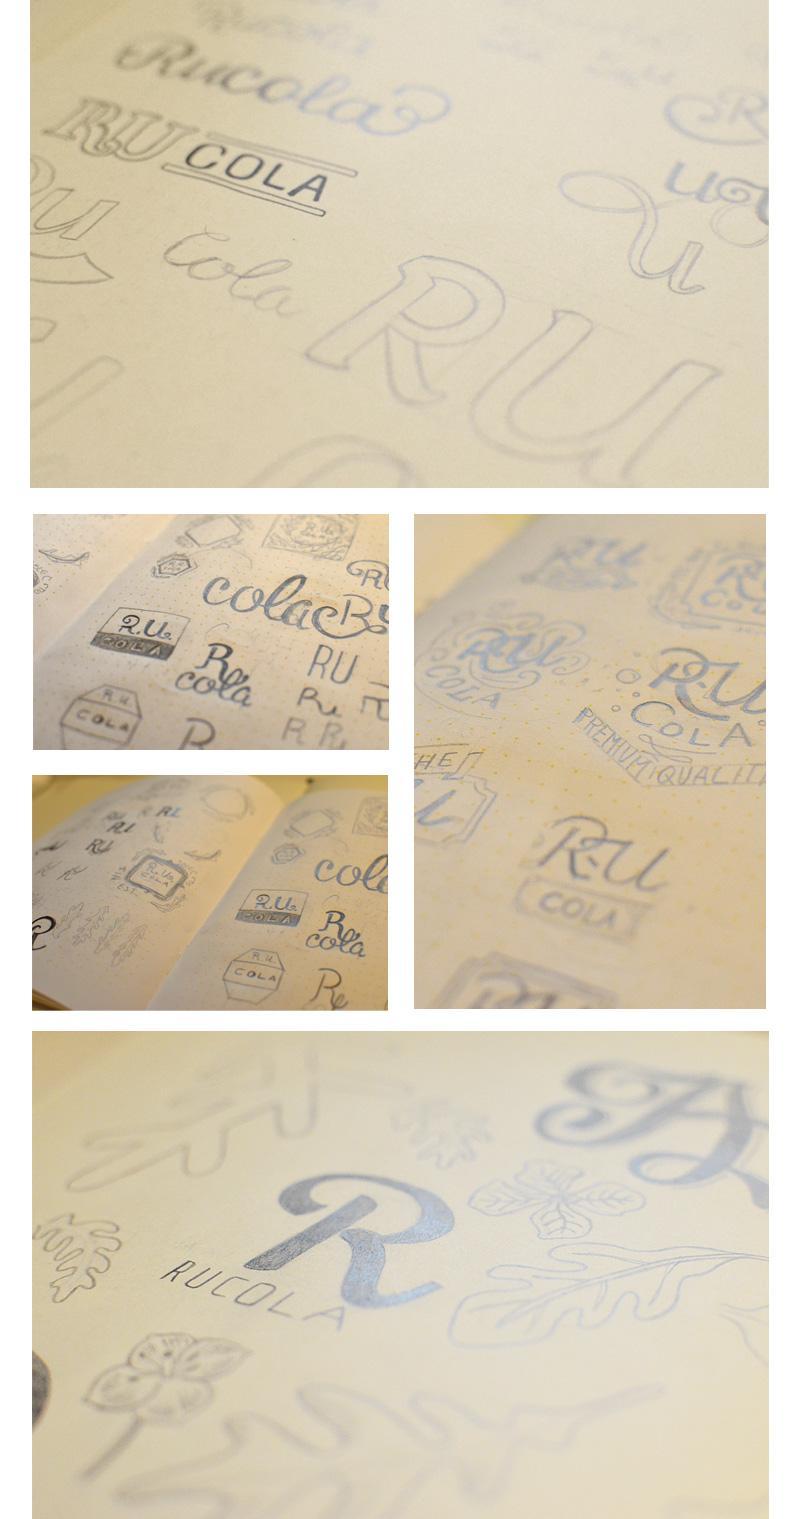 R.U. cola - image 1 - student project